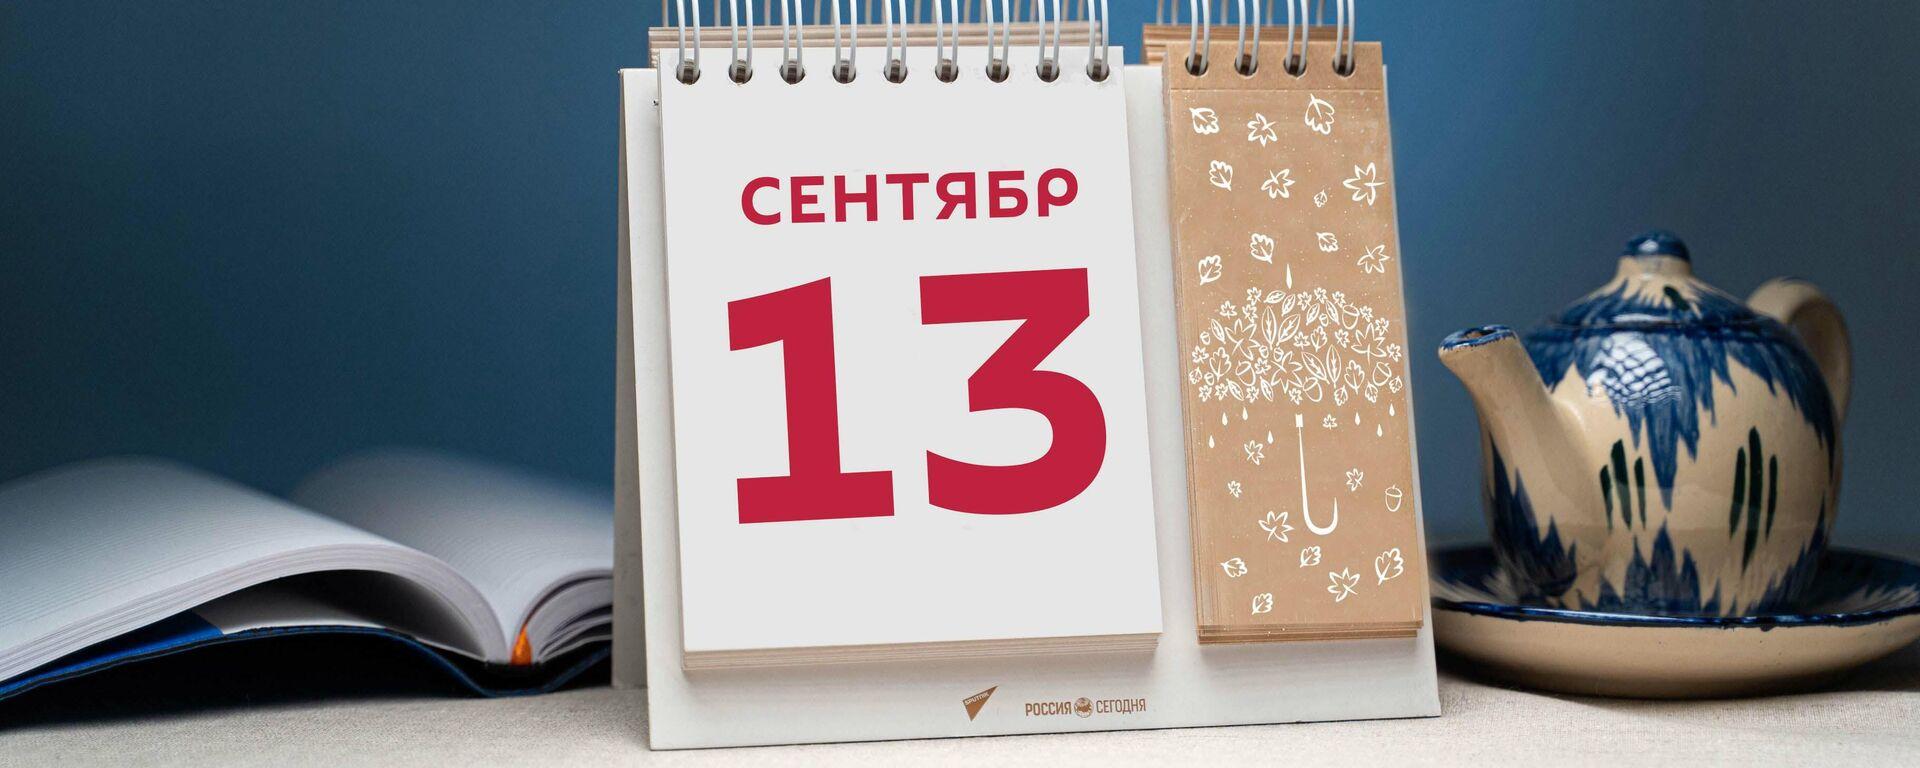 День 13 сентября - Sputnik Тоҷикистон, 1920, 13.09.2021